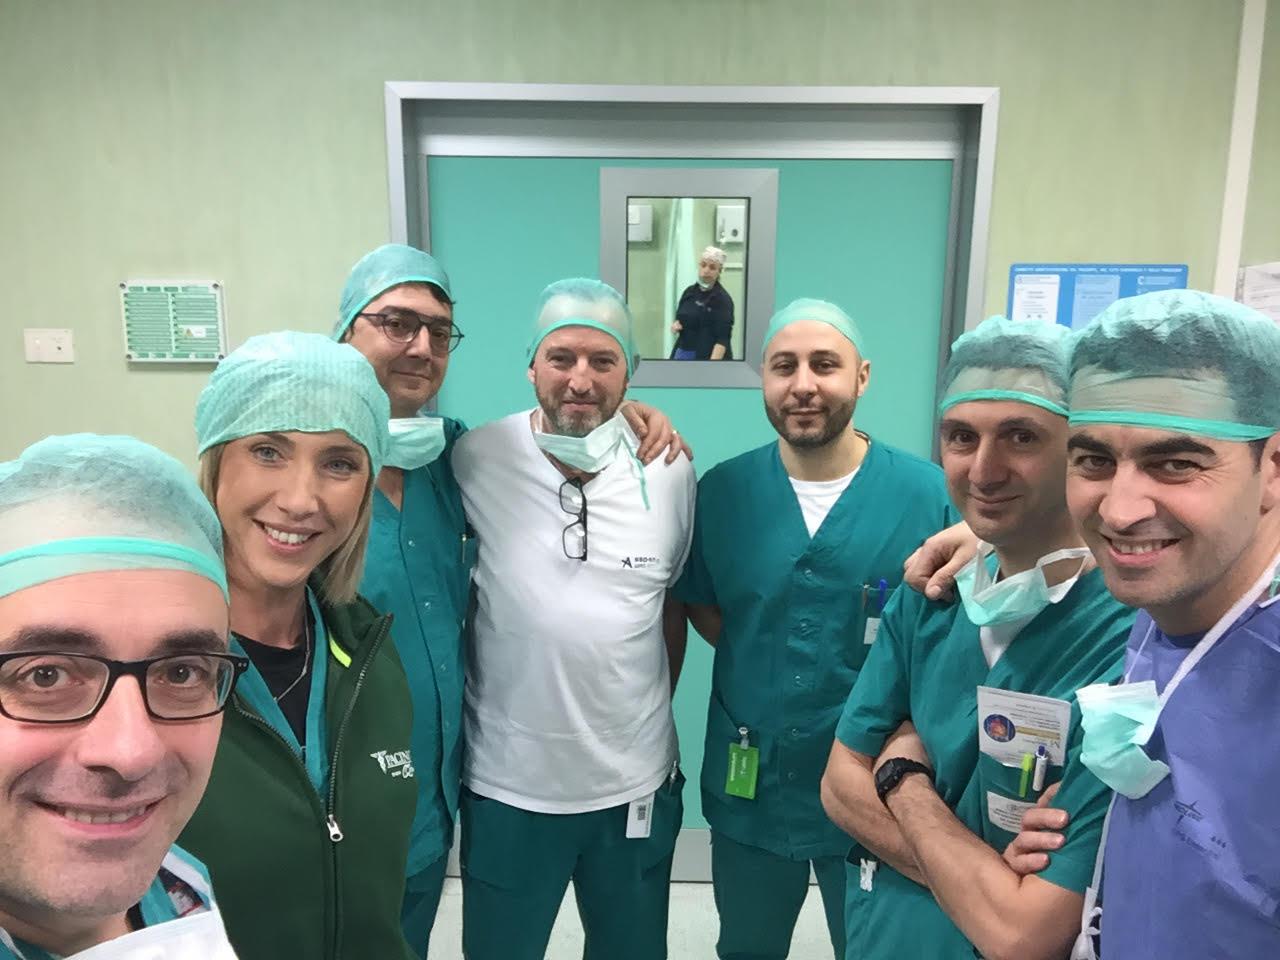 Chirurgia senza bisturi, l'ospedale di Perugia tra i primi centri Italiani d'eccellenza